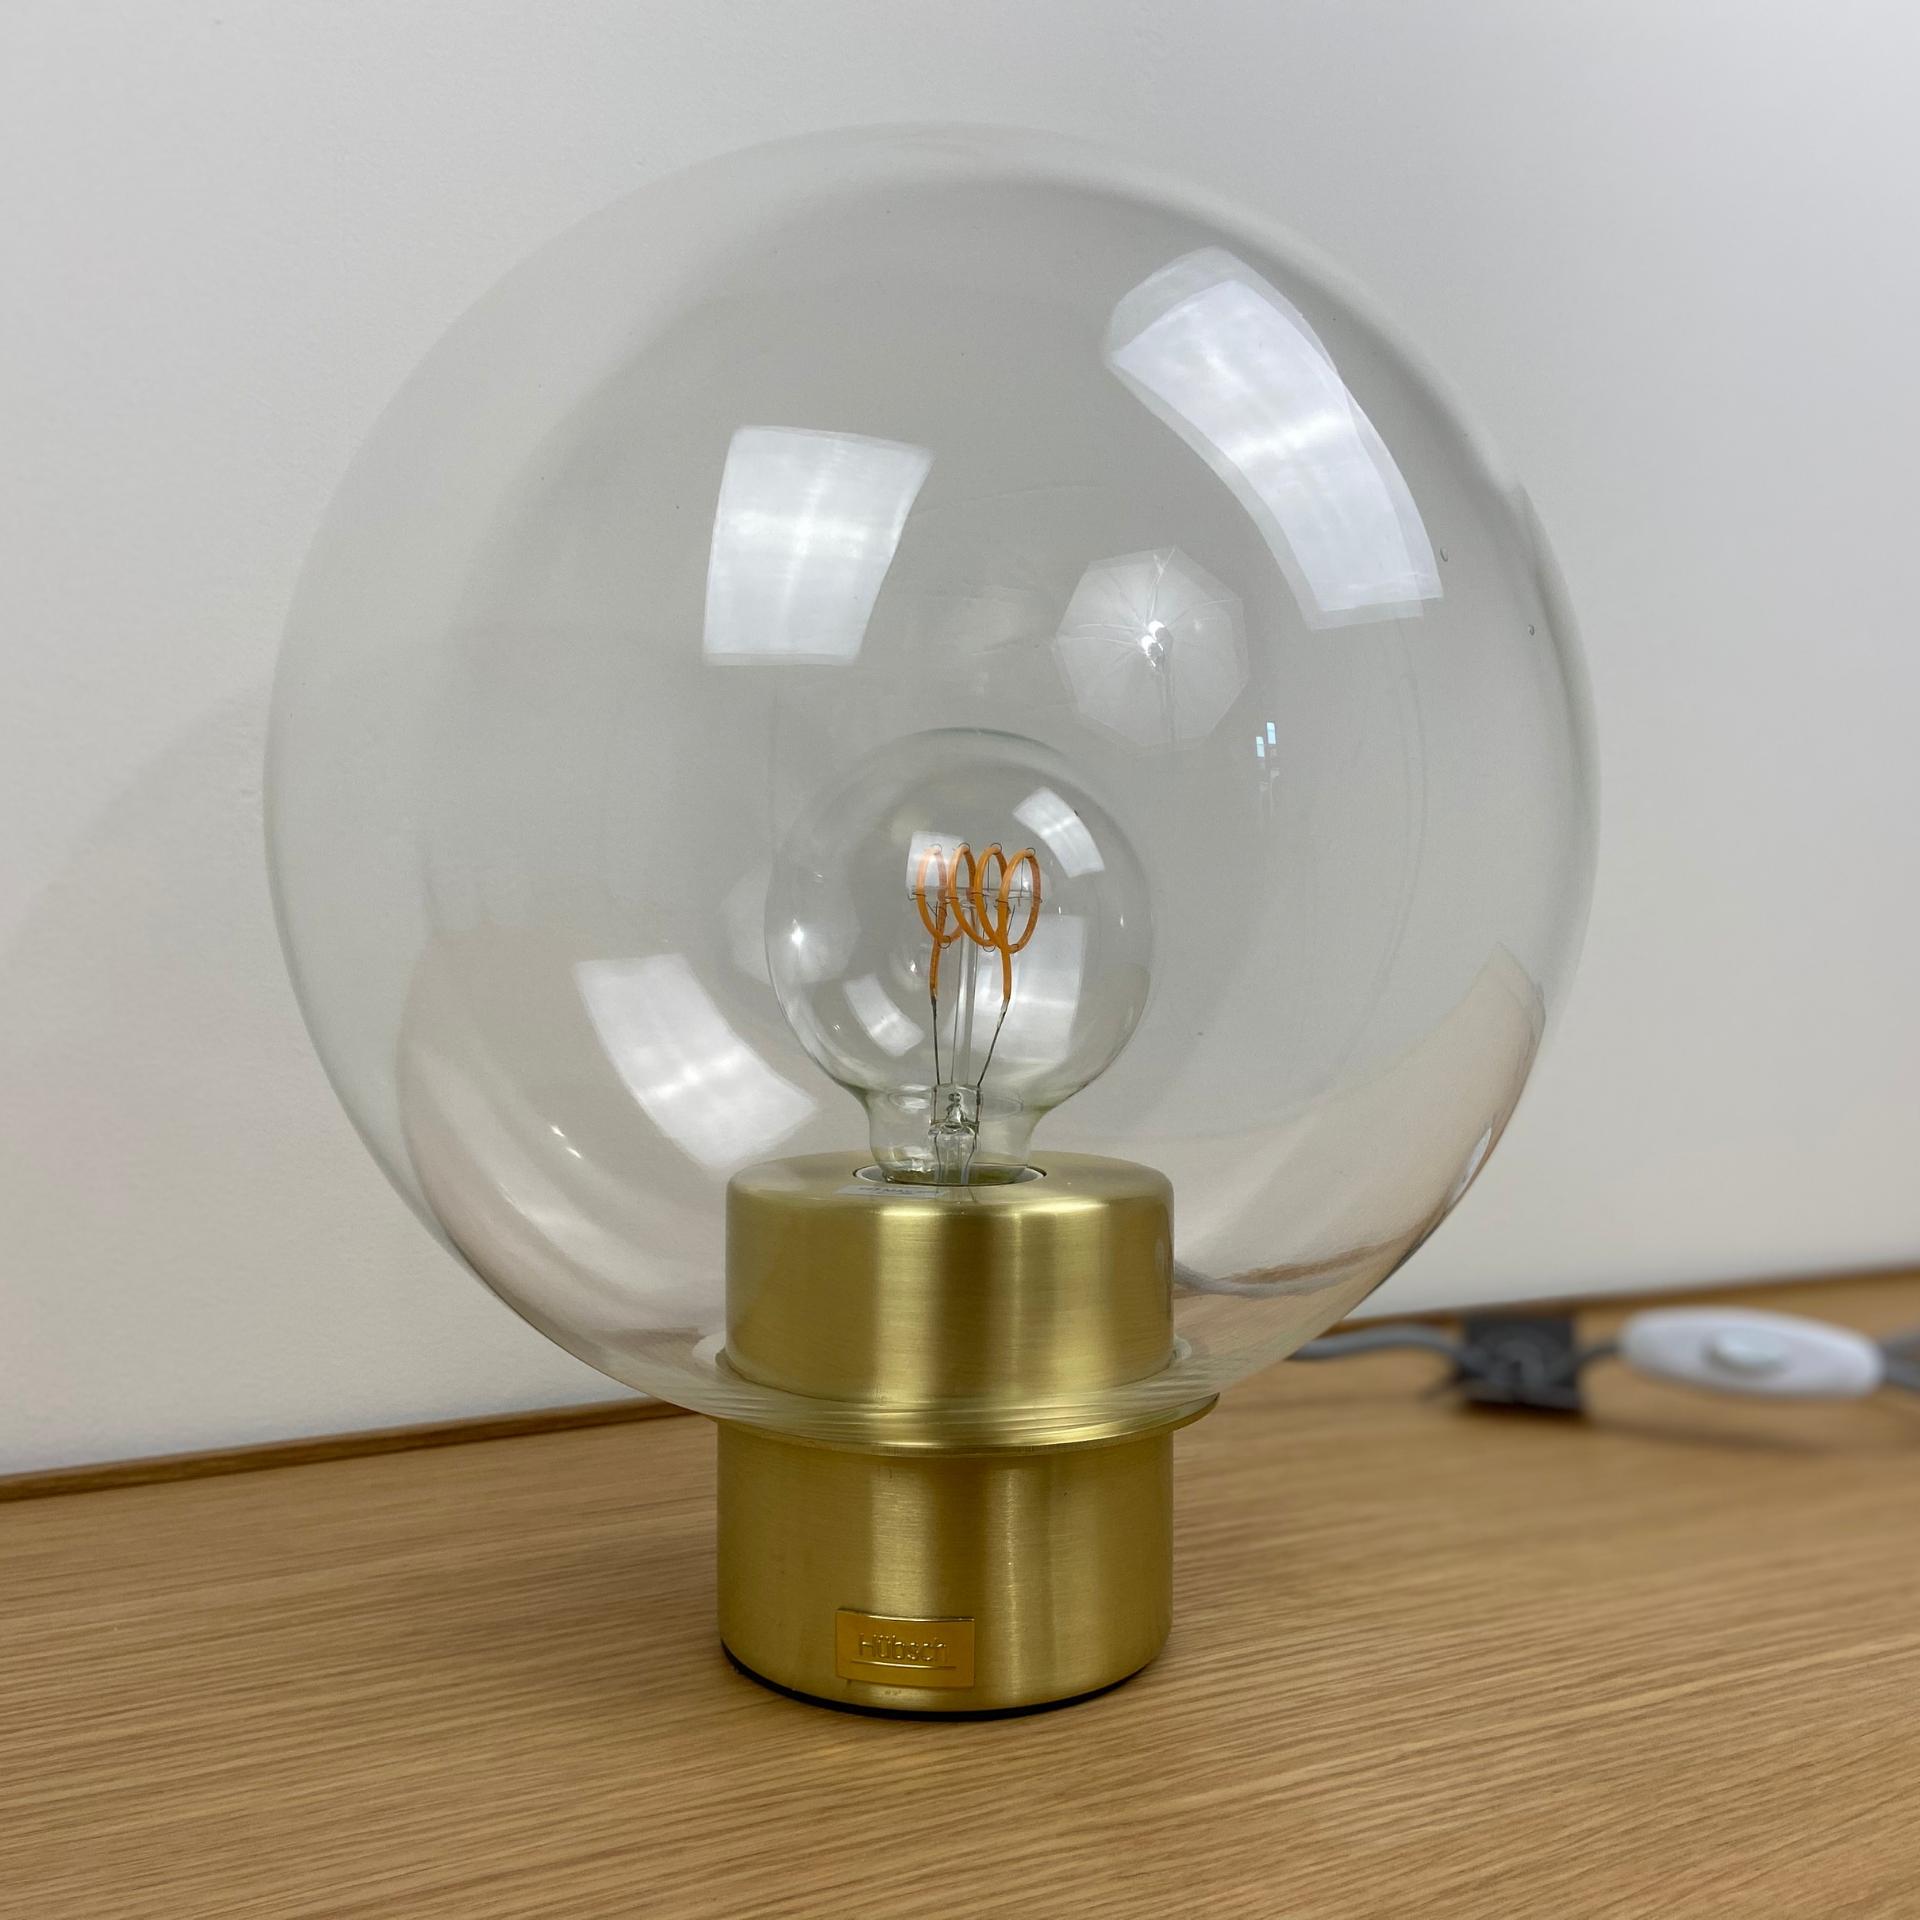 J-line LED E27 4W standaard 12 cm filament lichtbron